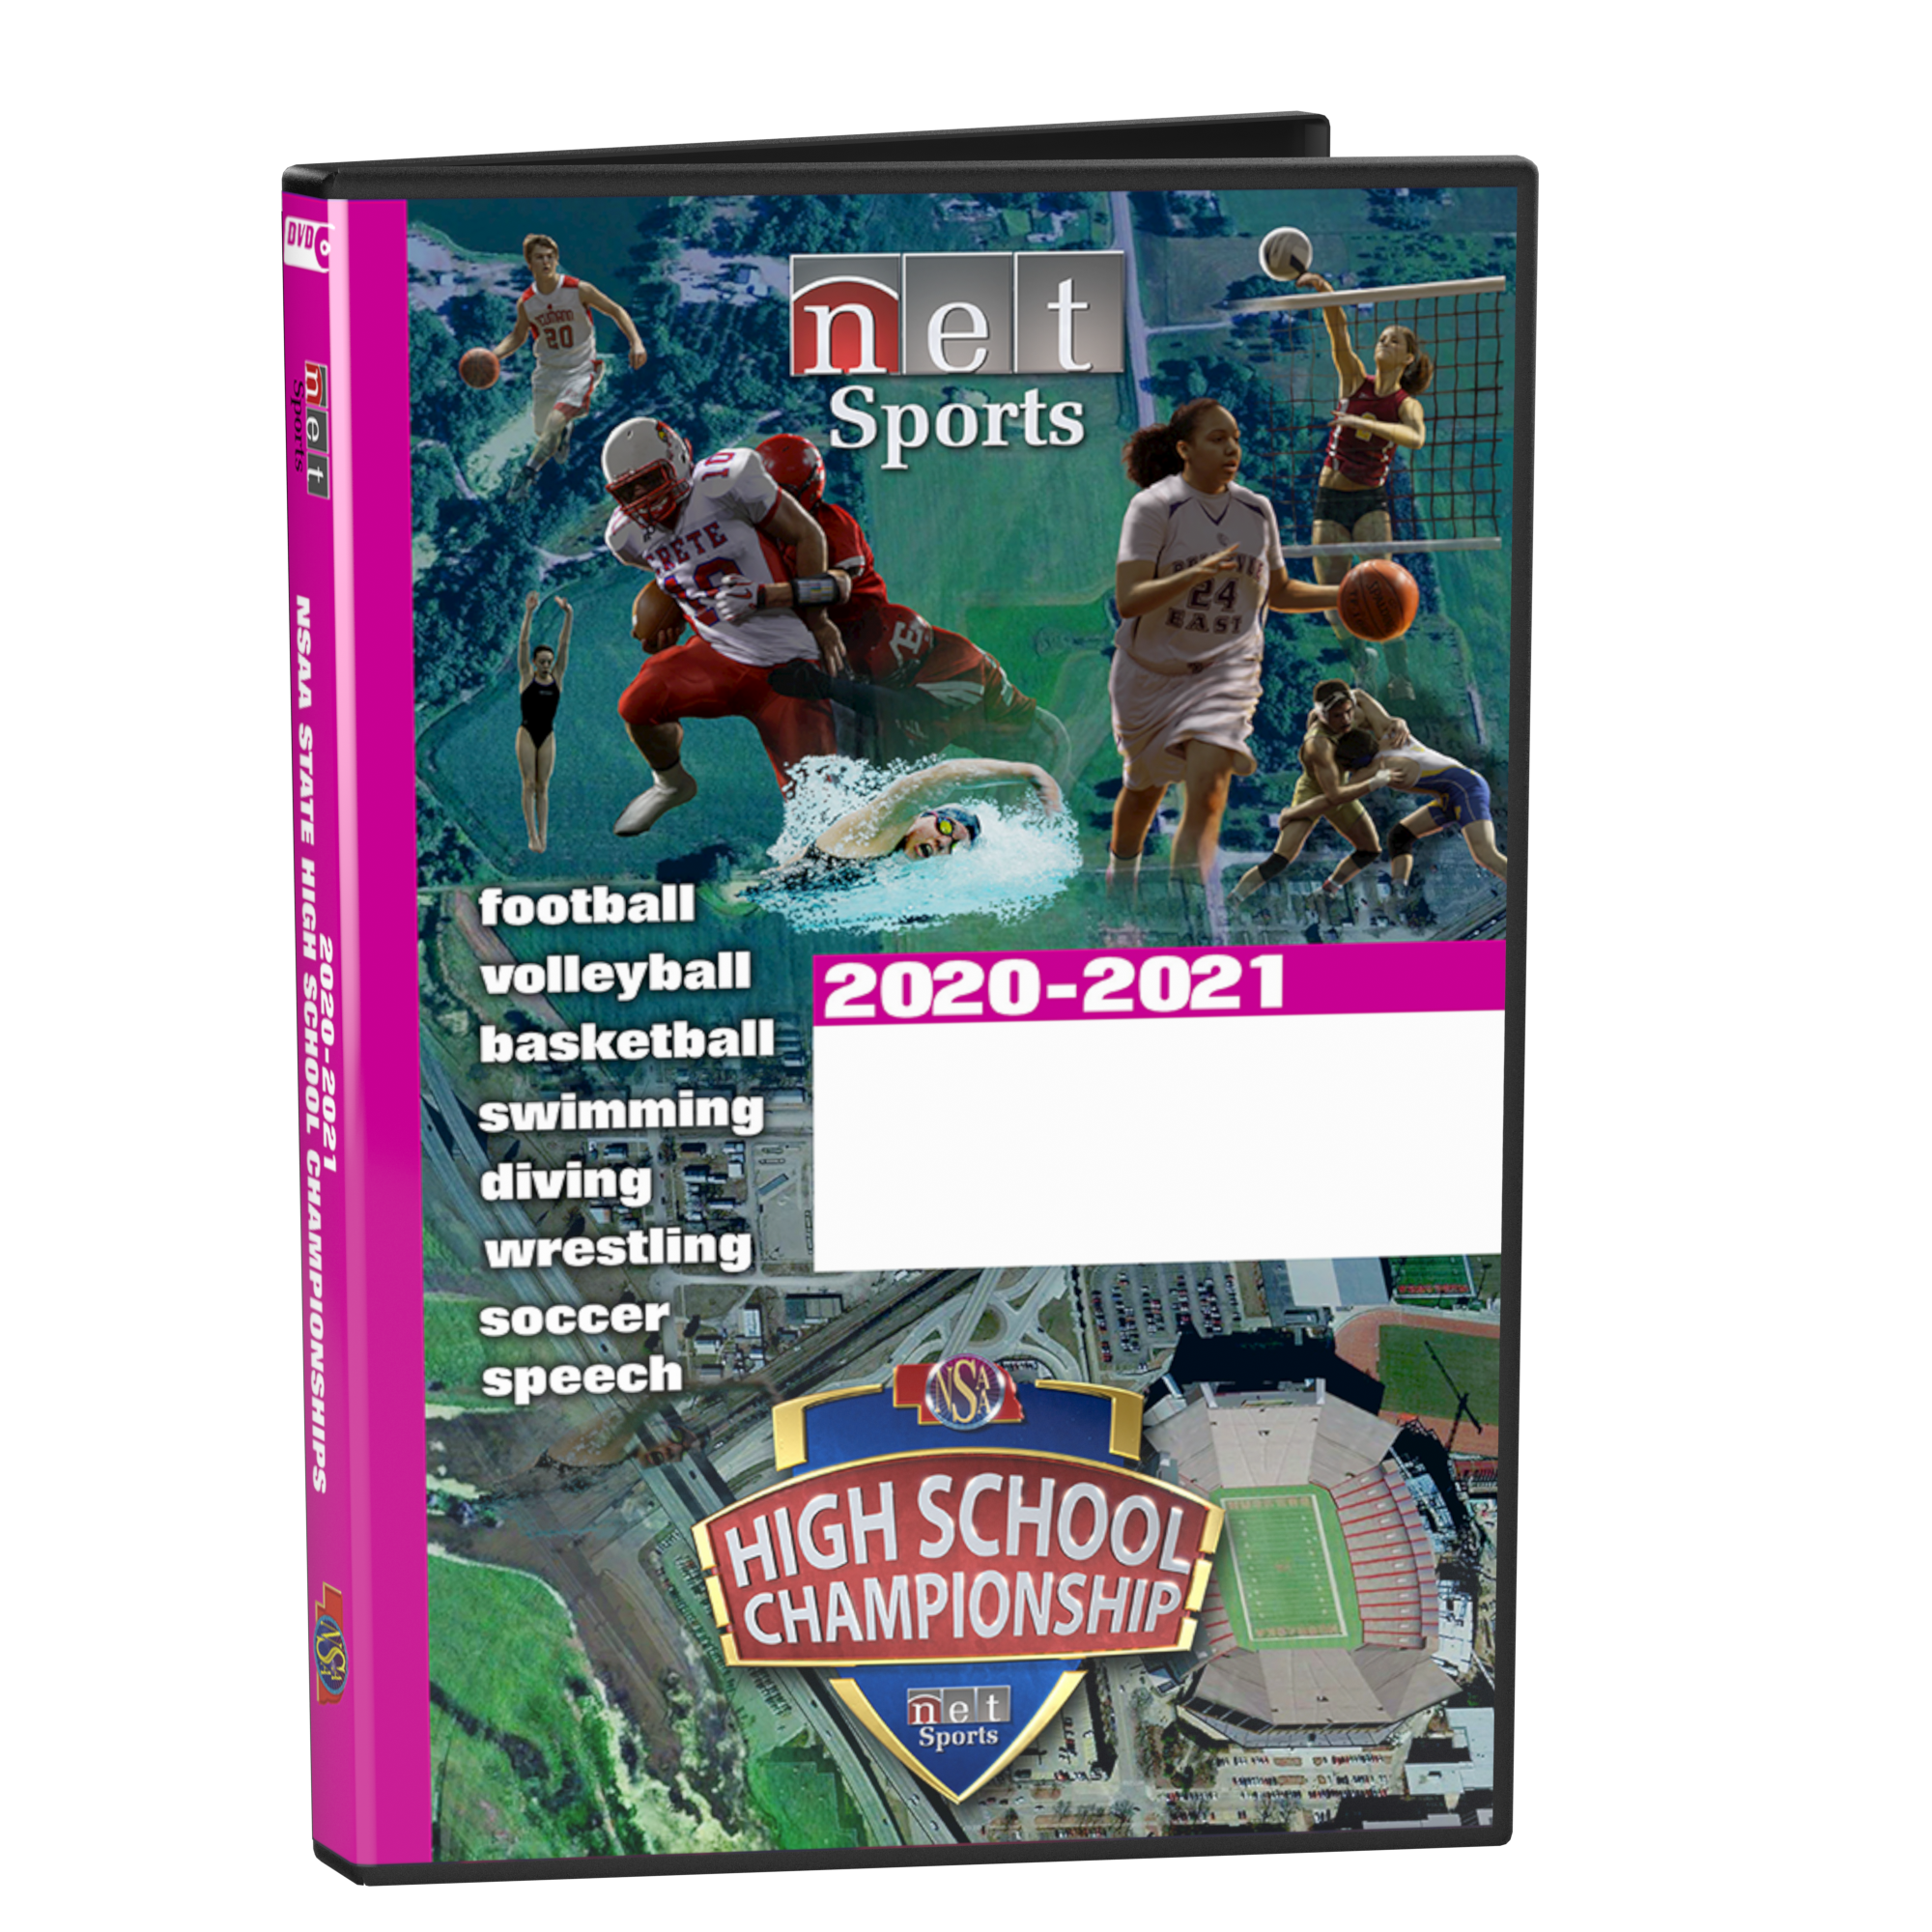 Football NSAA State High School Championship (Nov 2020)